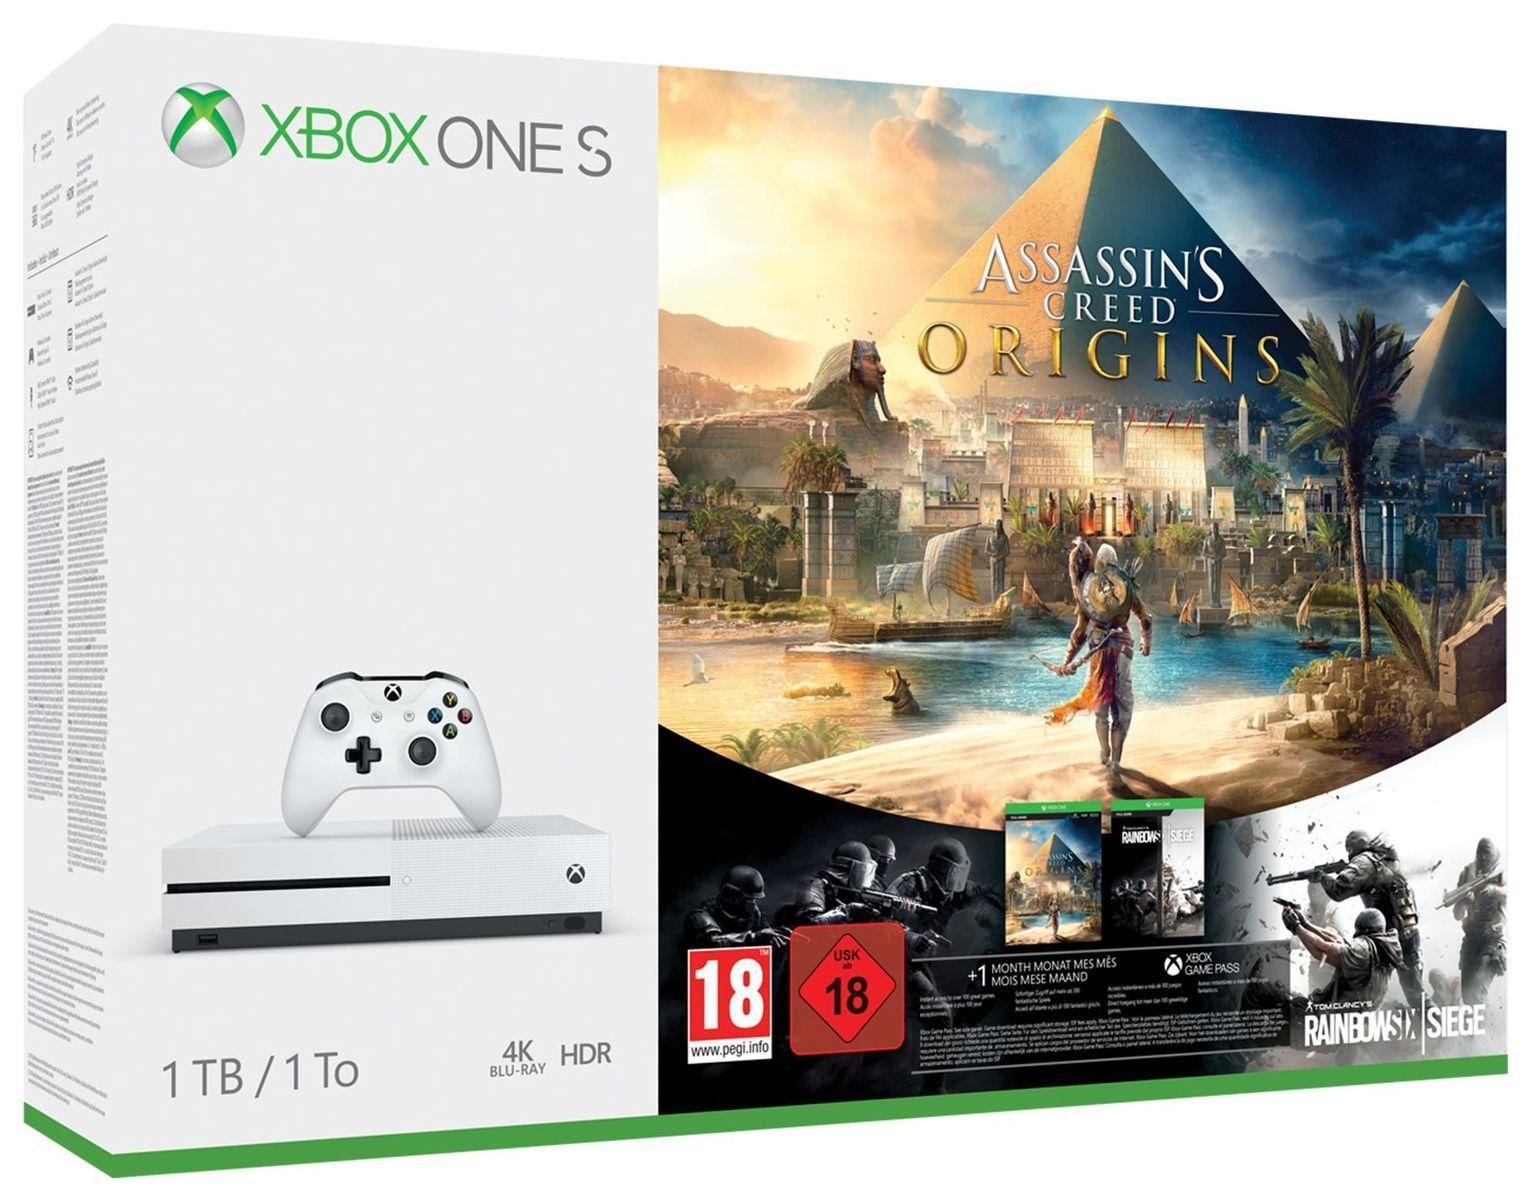 Xbox One S 1TB Assassin's Creed Origins & Rainbow 6 Siege Console Bundle - White, £214.99 at Argos/eBay